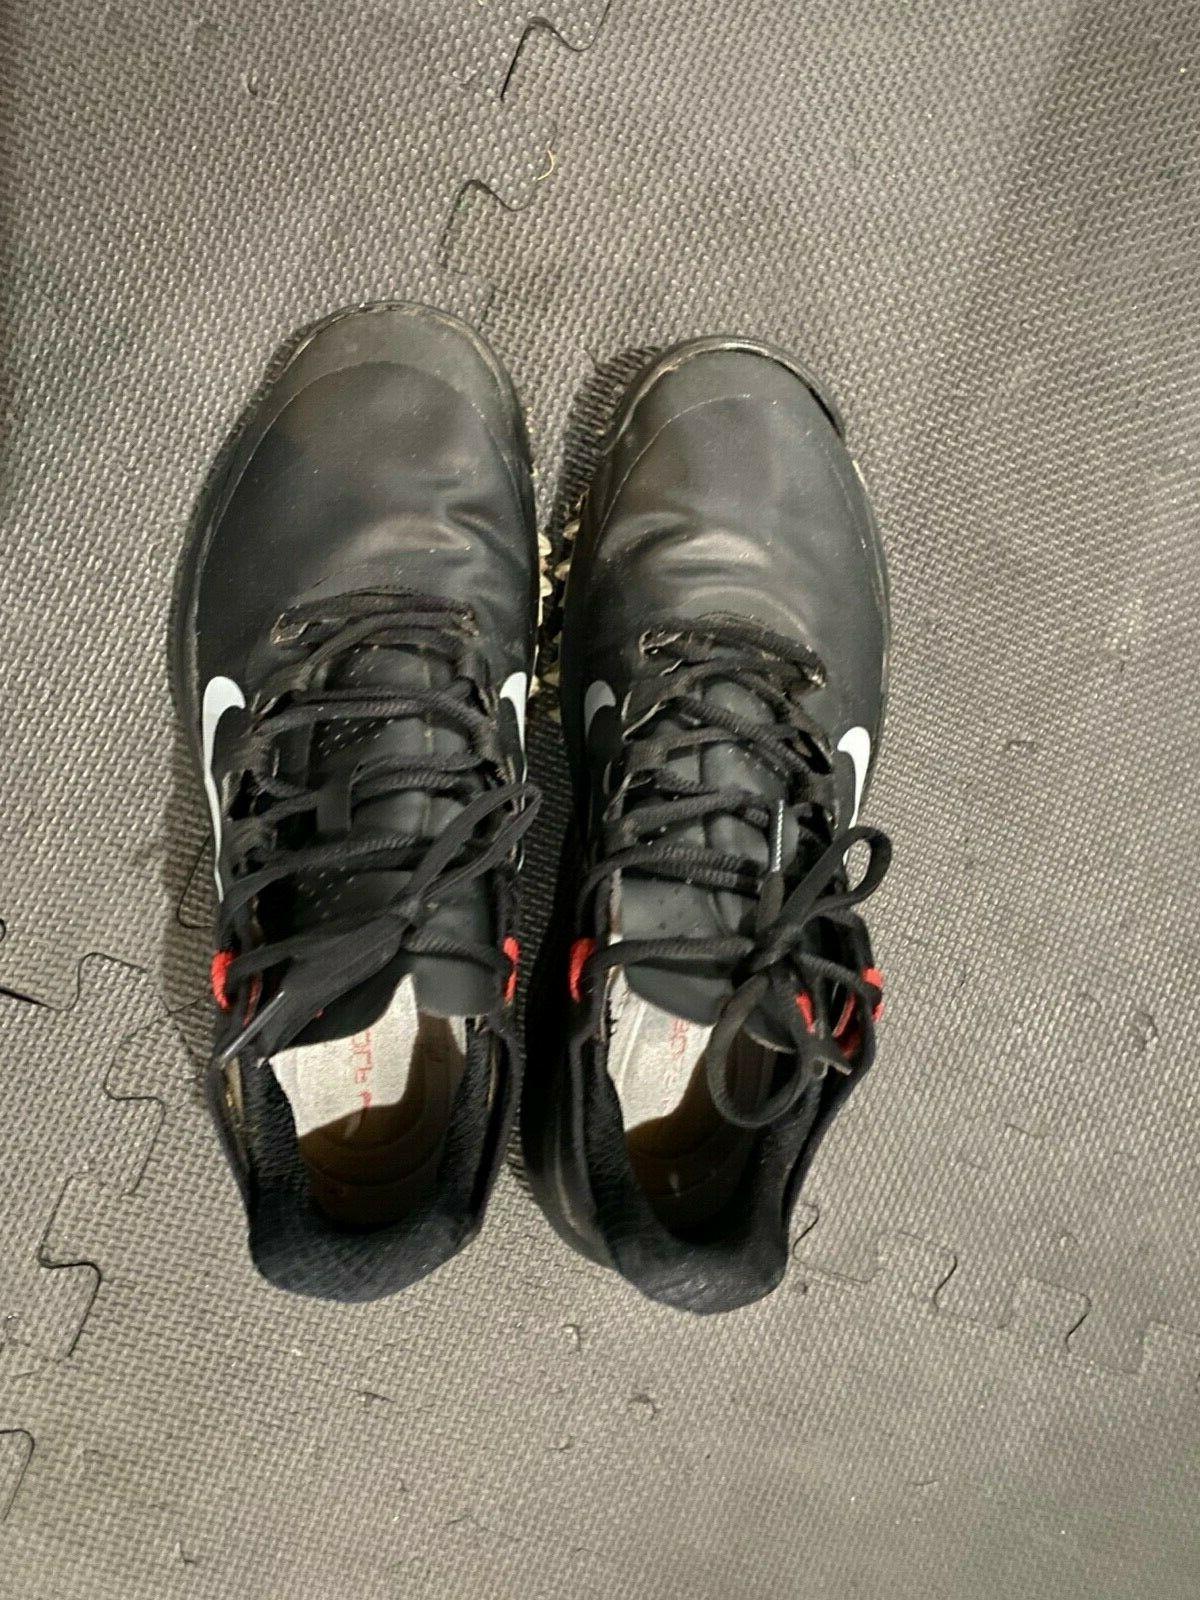 Nike, TW13, Golf Black, Size